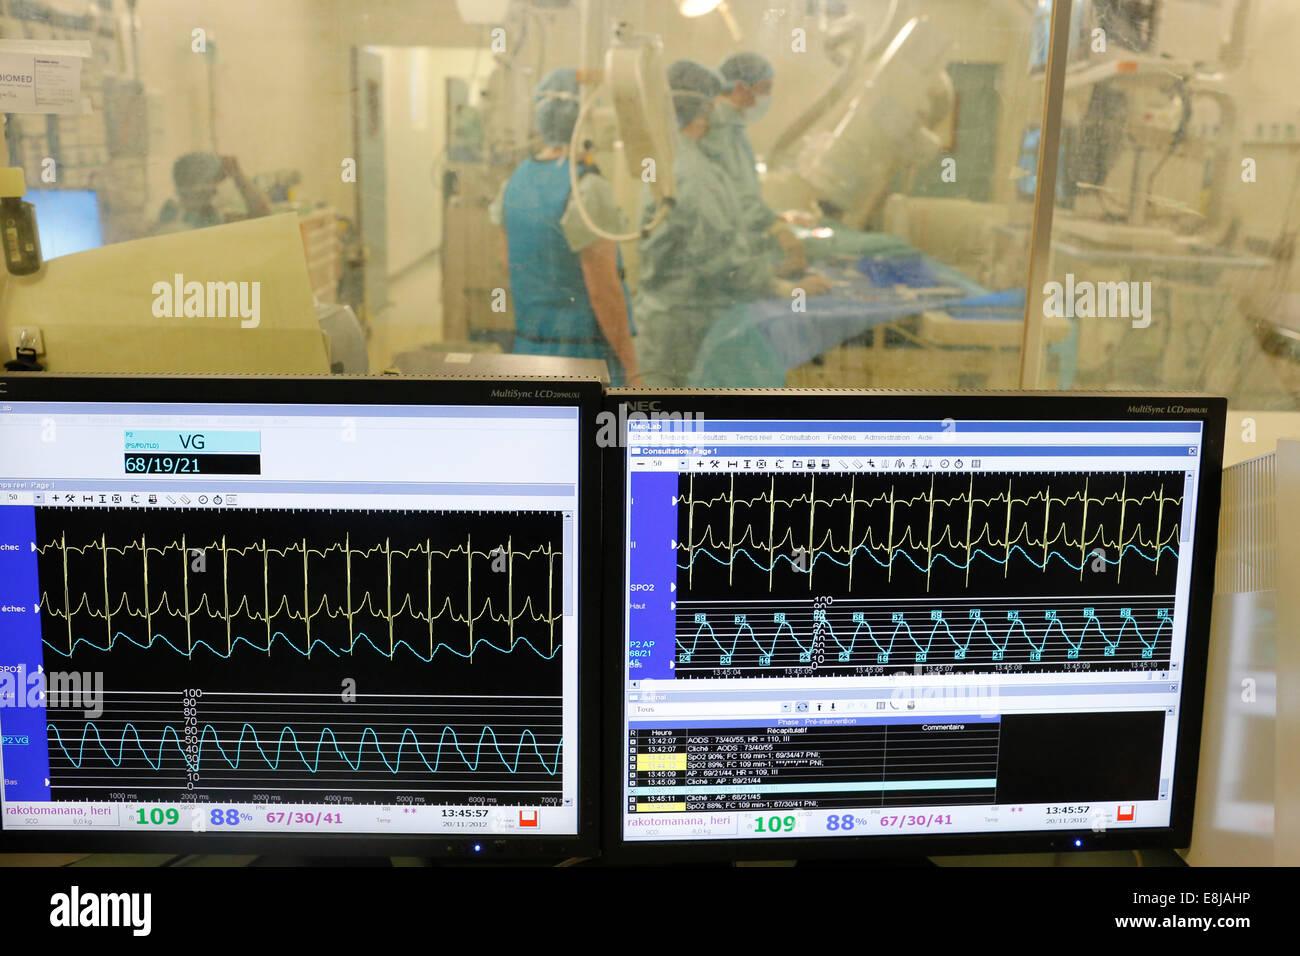 Heart surgery monitoring (catheterism) - Stock Image